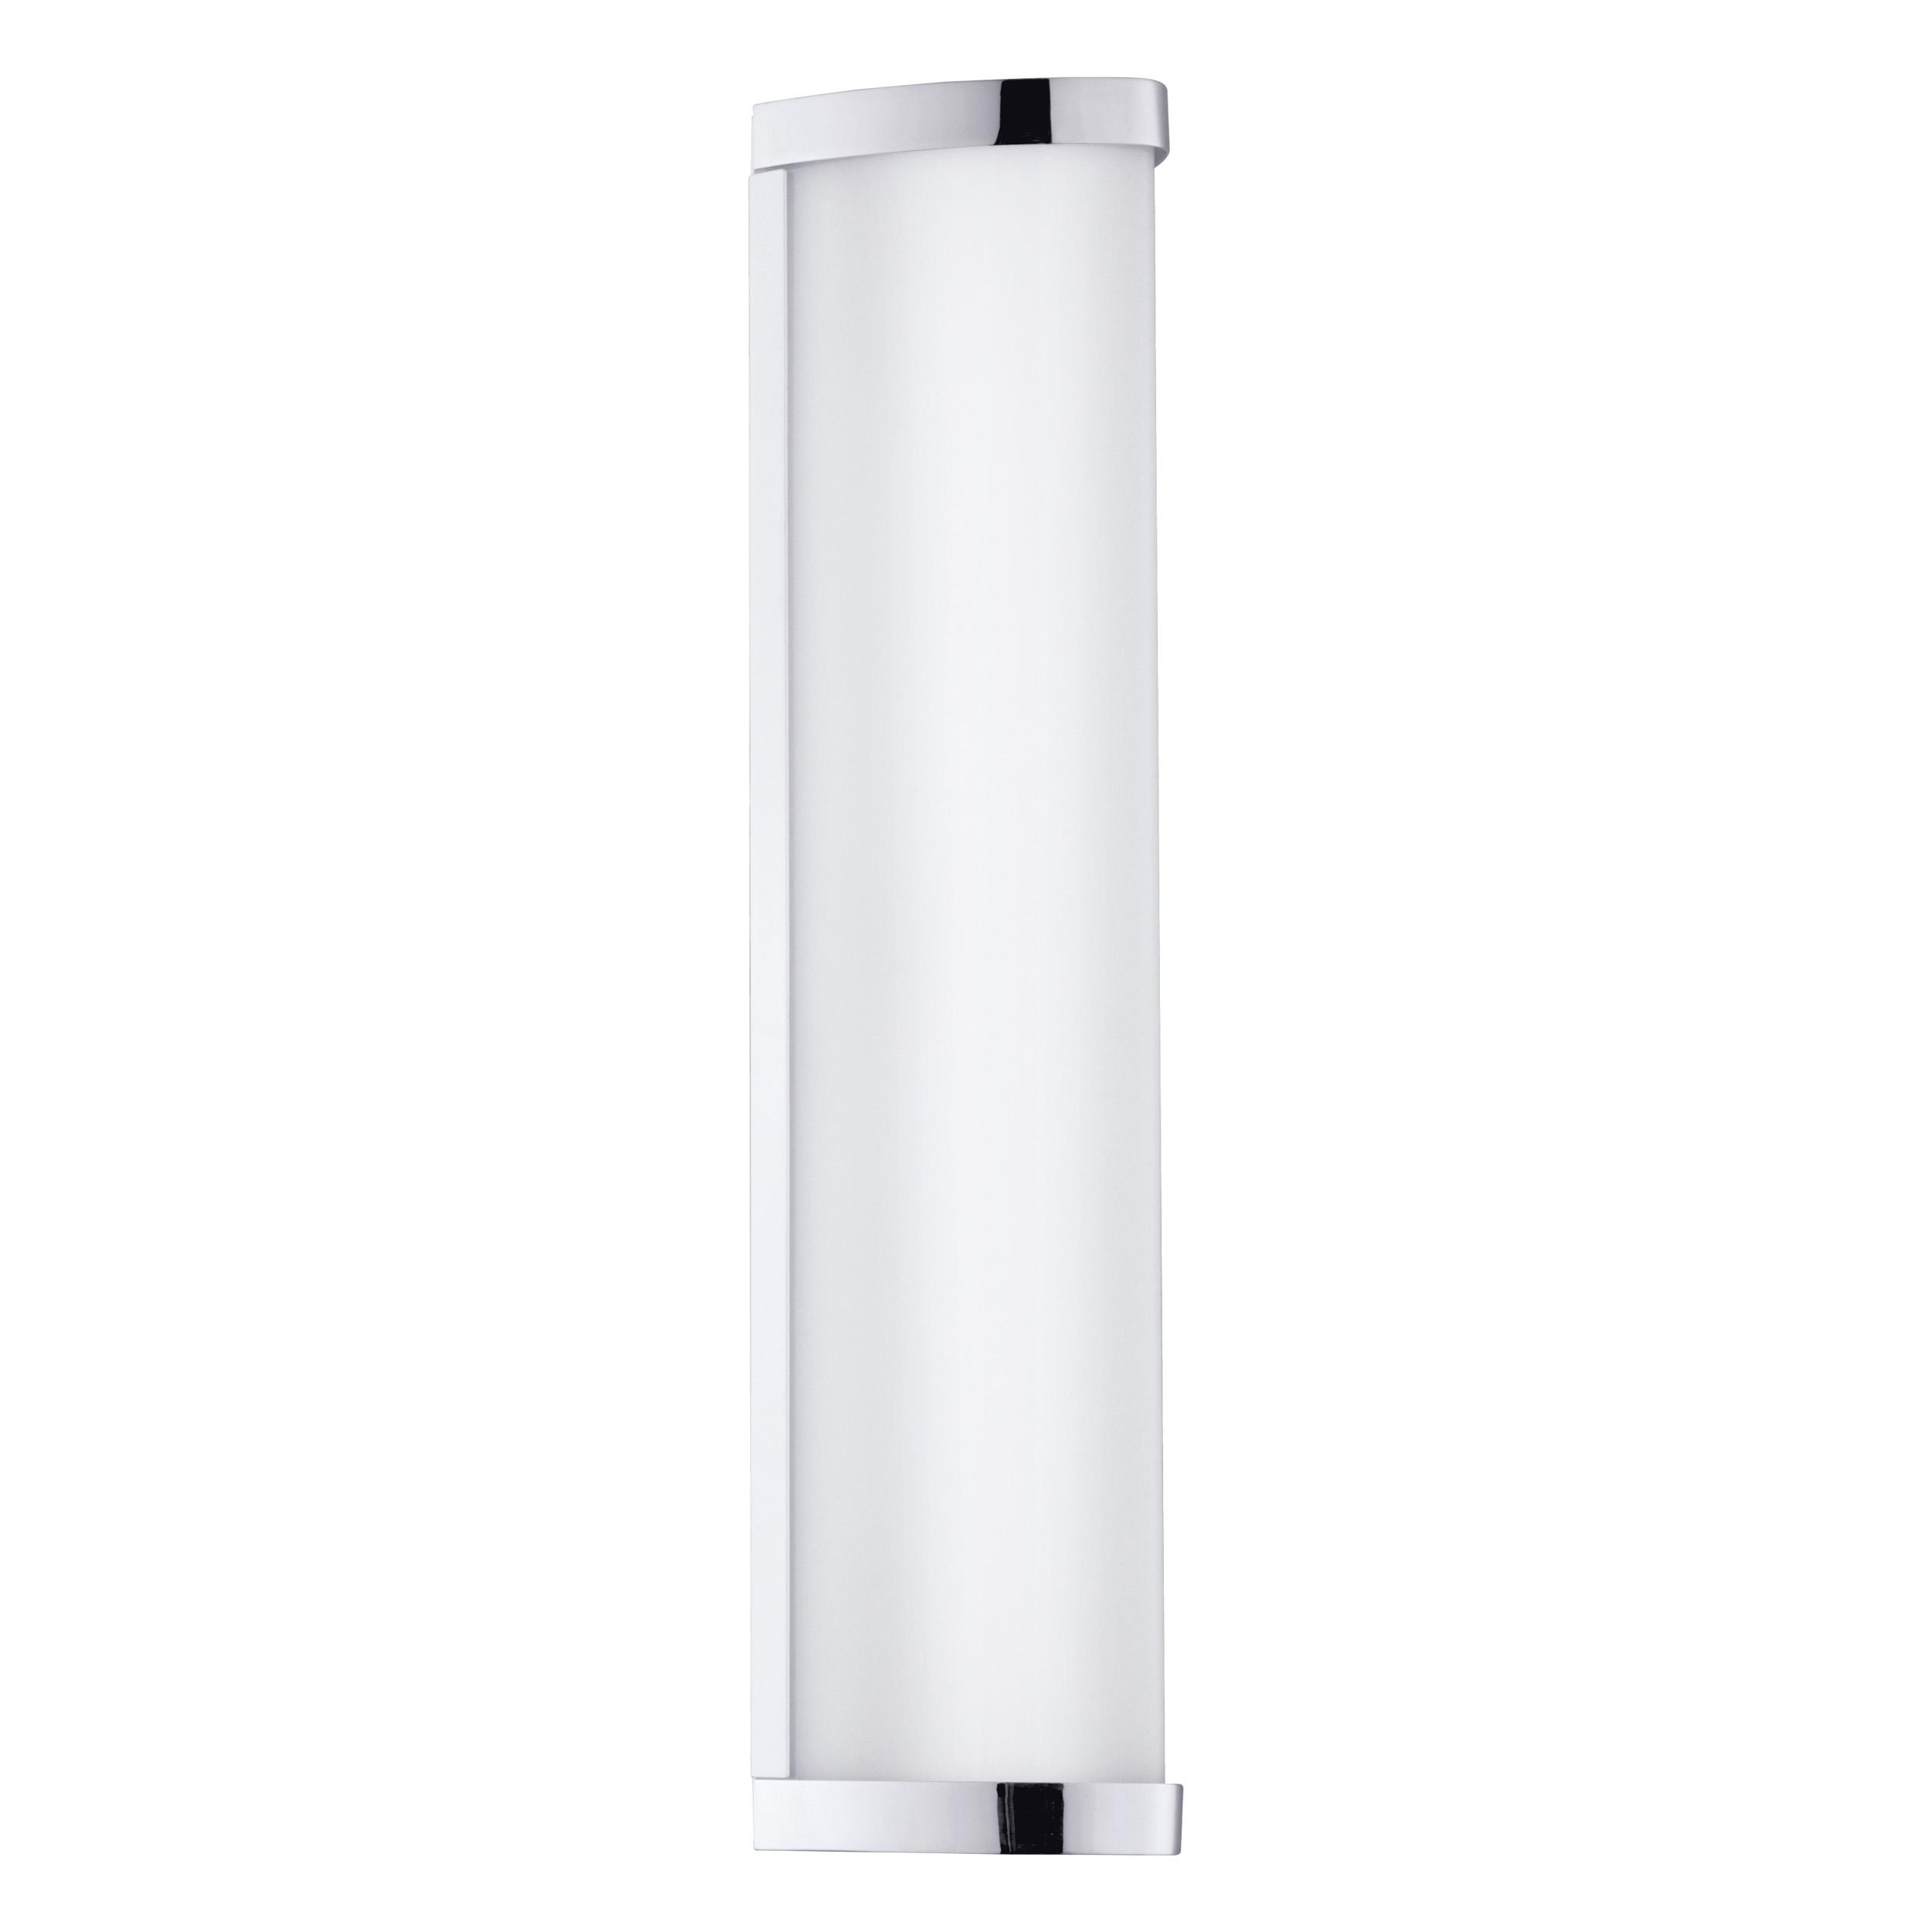 1 Stk LED-Wandleuchte Gita 2 Pro 8,3W 4000K chrom/weiss IP20 LI64044---